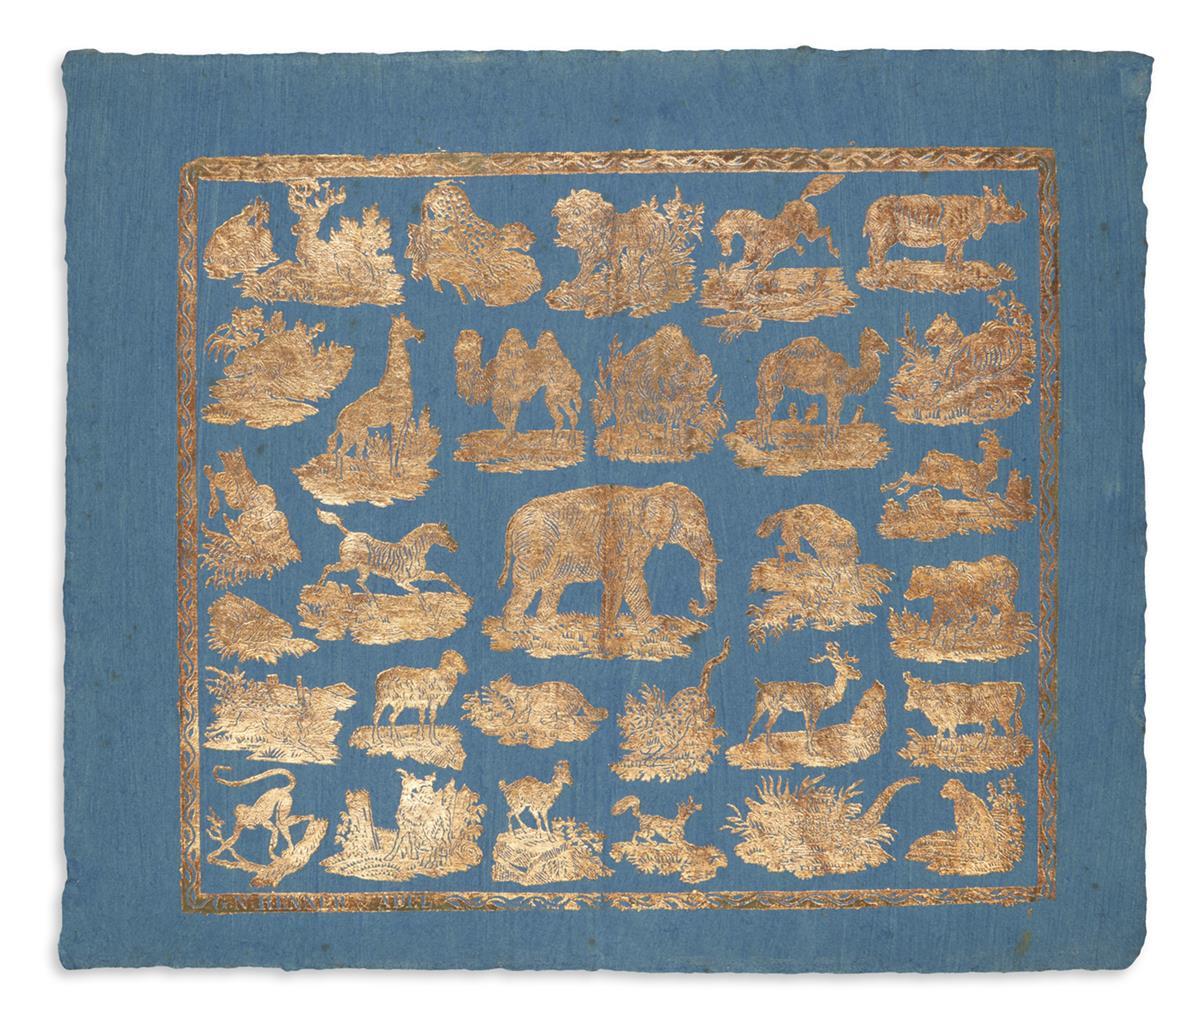 (NATURAL-HISTORY)-GN-Renner--Abel-Gilt-embossed-animal-themed-brocade-on-blue-washed-laid-paper